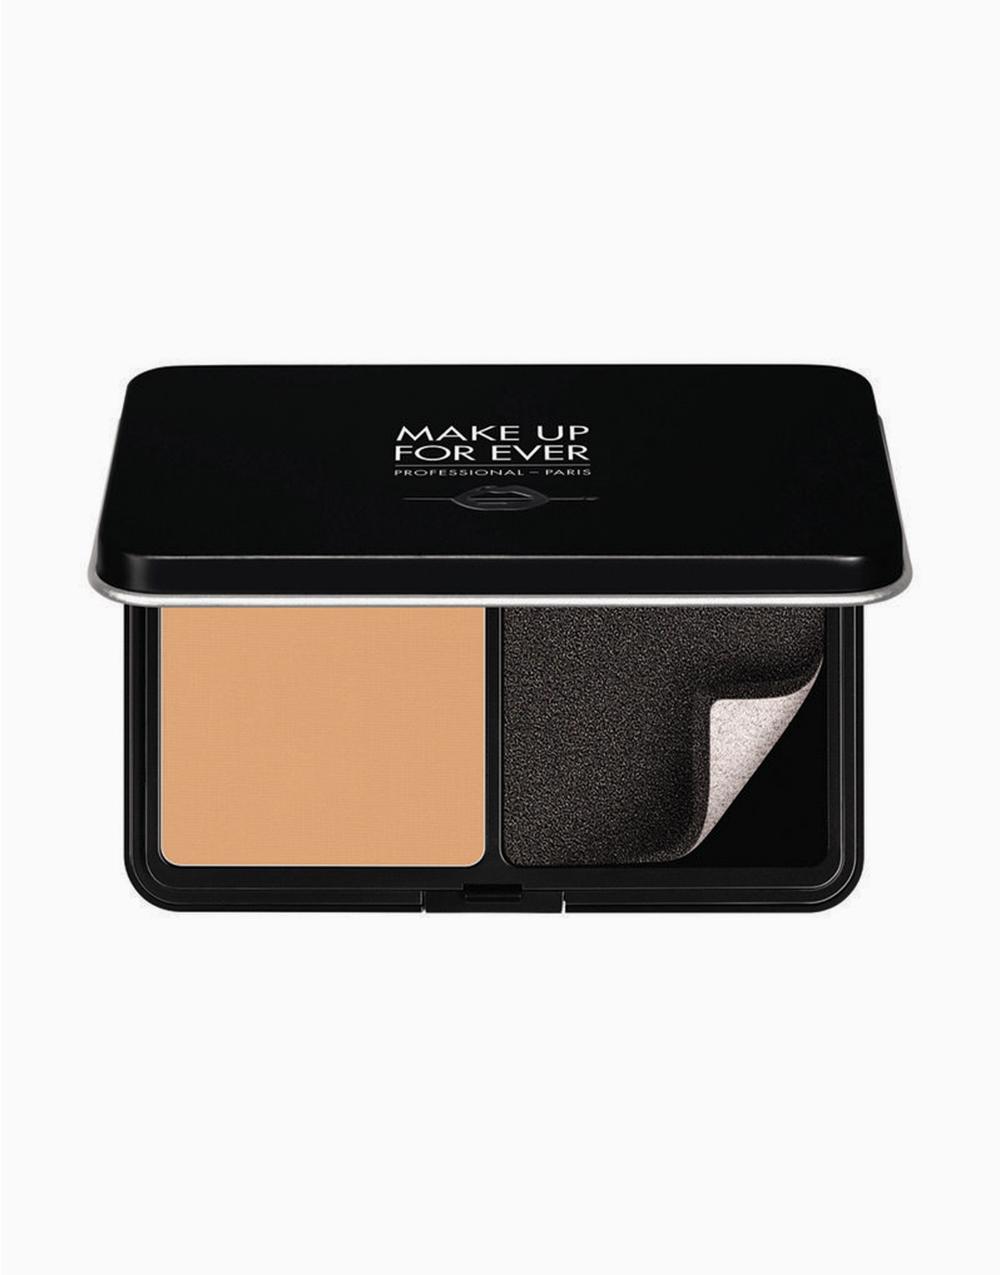 Matte Velvet Skin Compact (11g) by Make Up For Ever | Y345